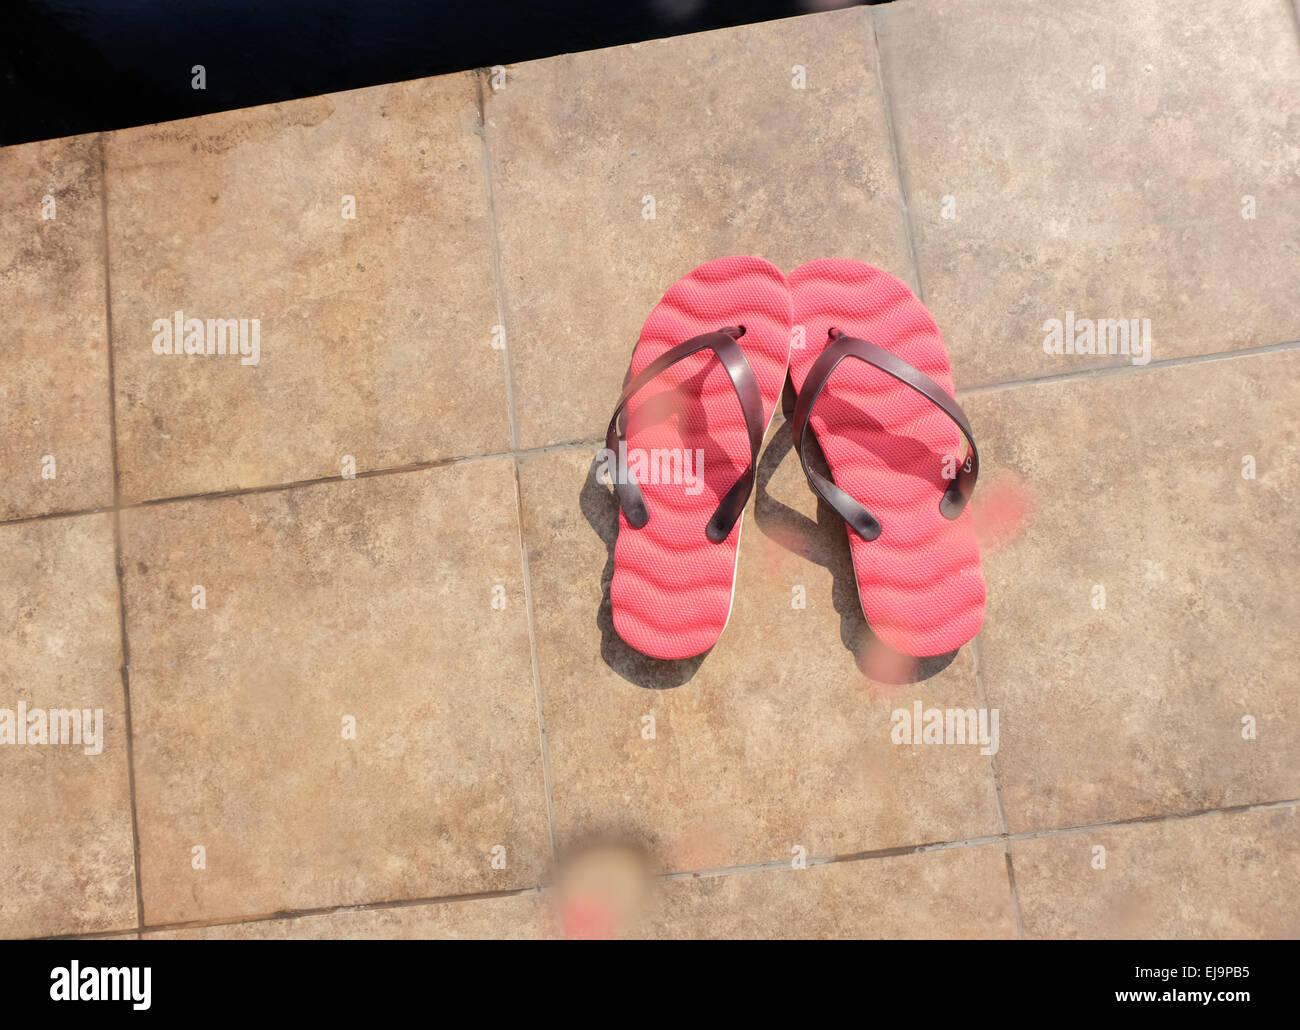 Il flip flop sul pavimento Foto Stock